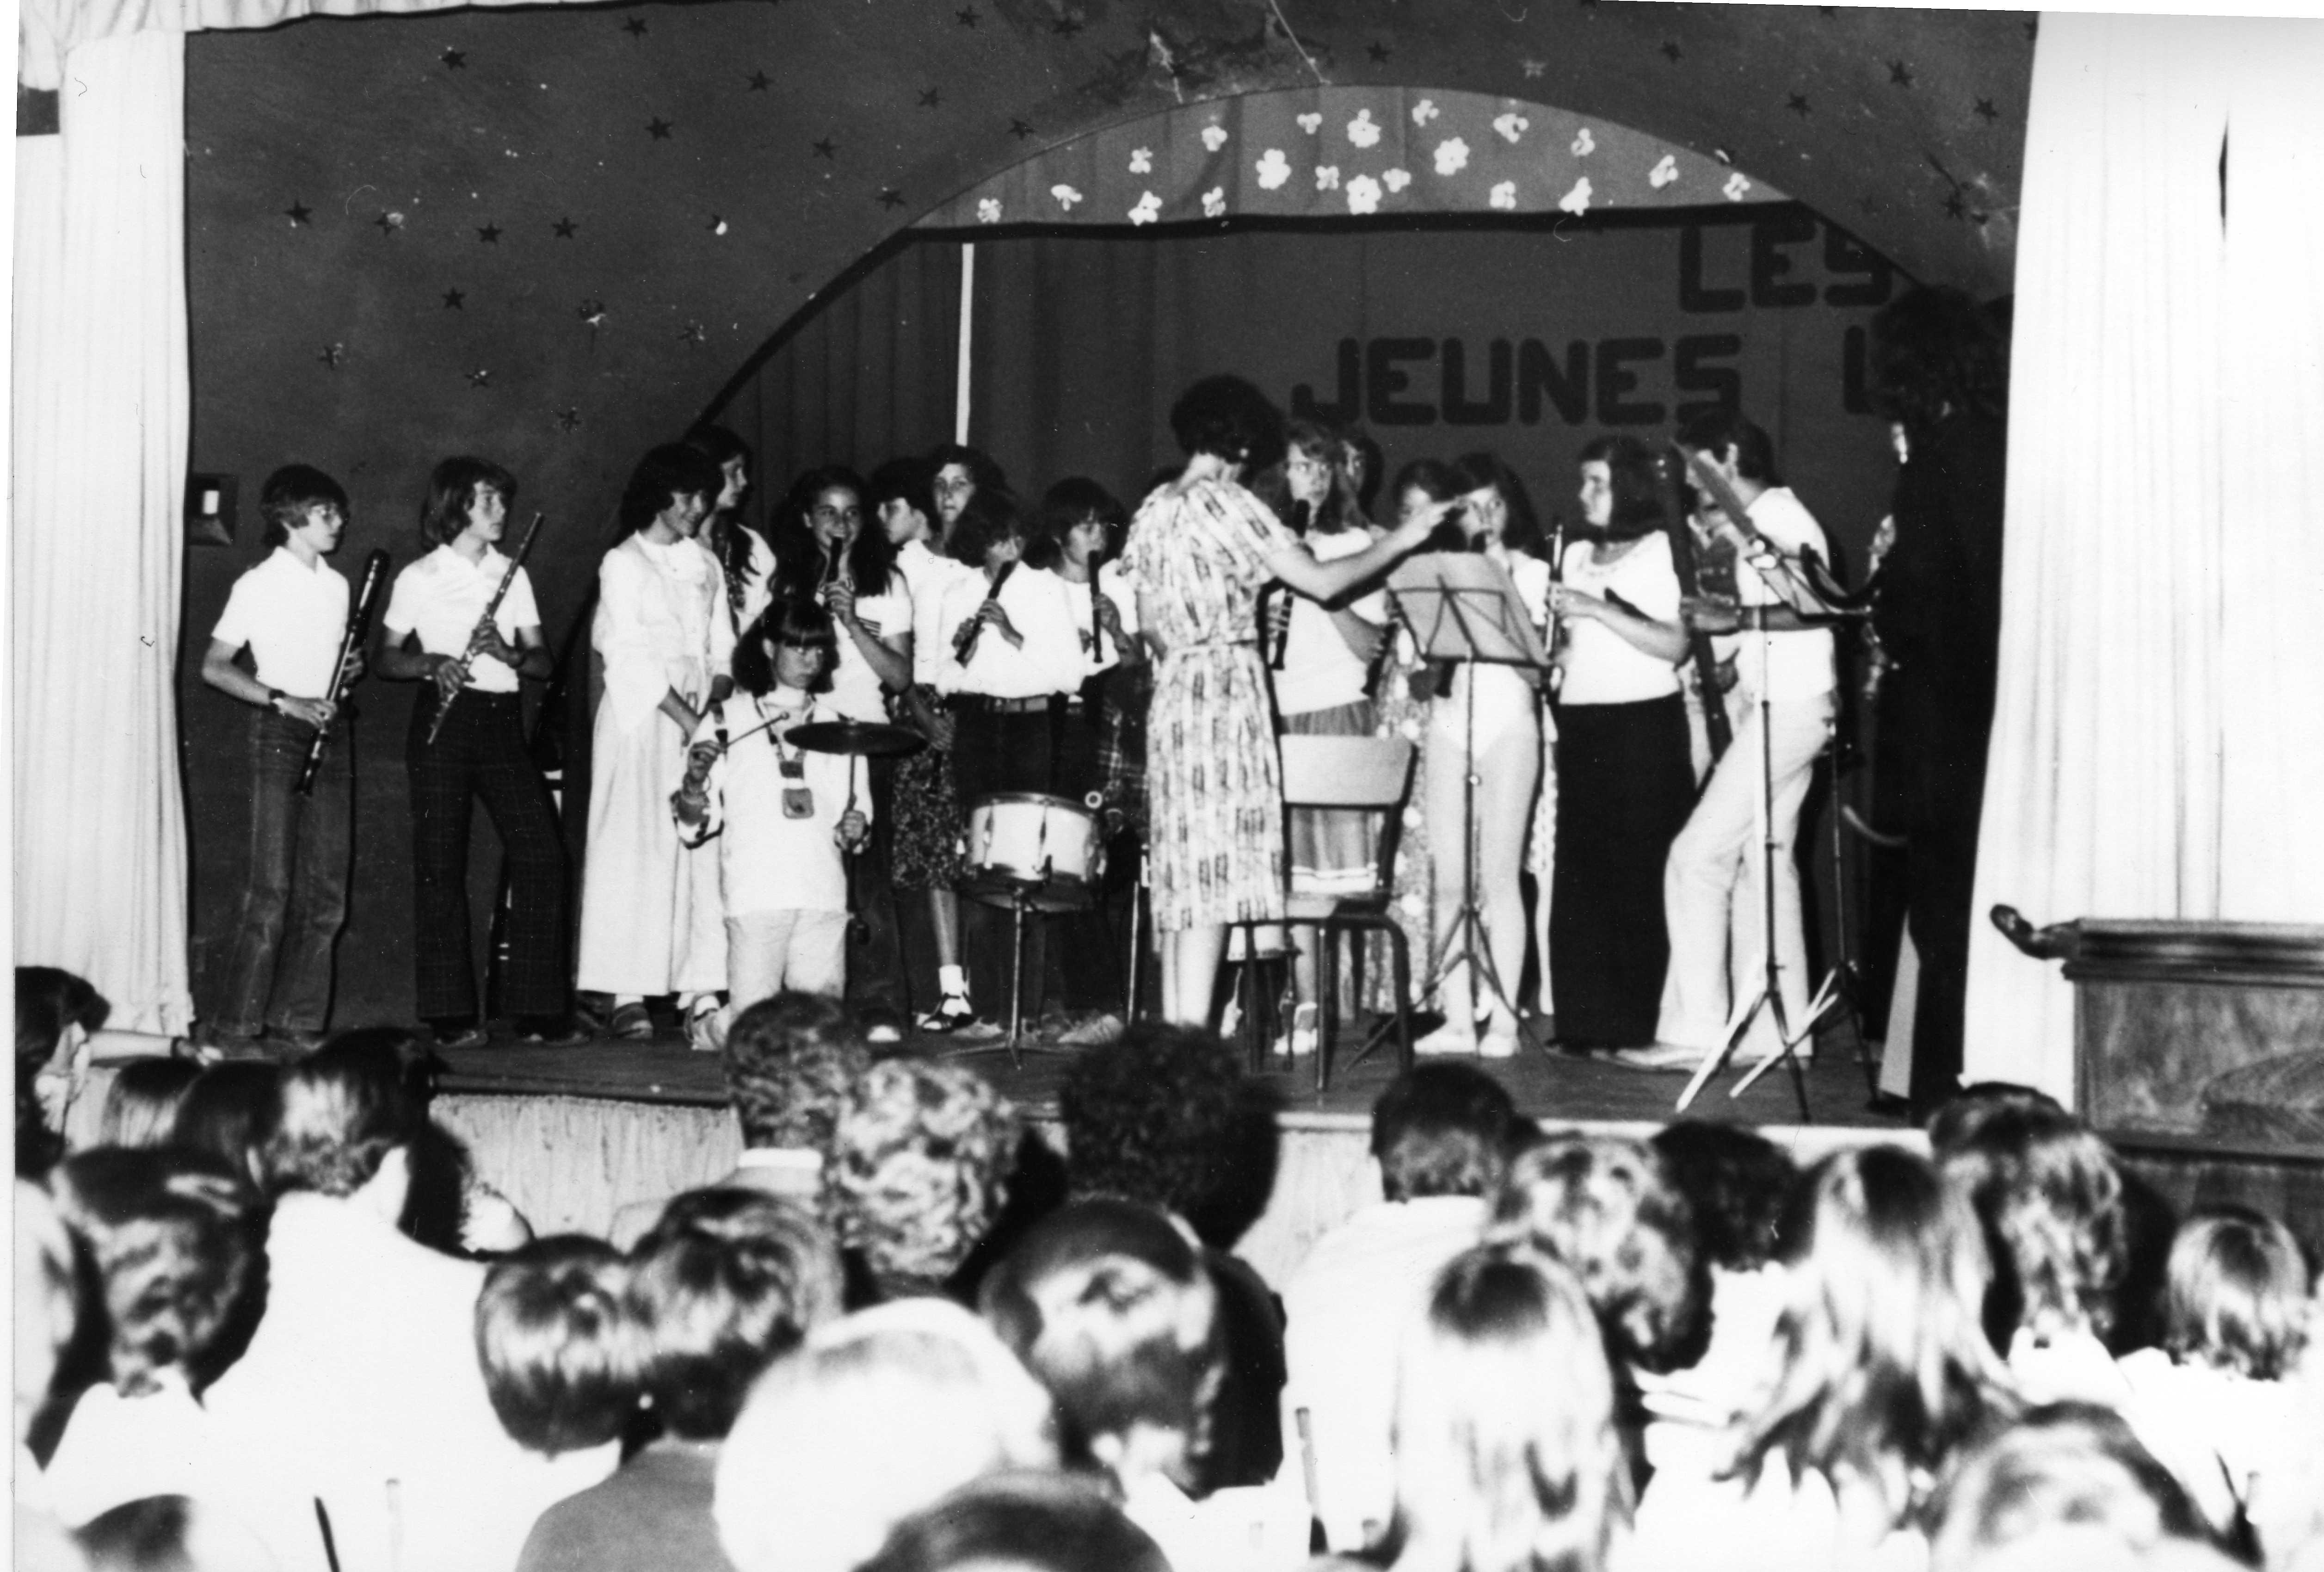 Orchestre 3 1980